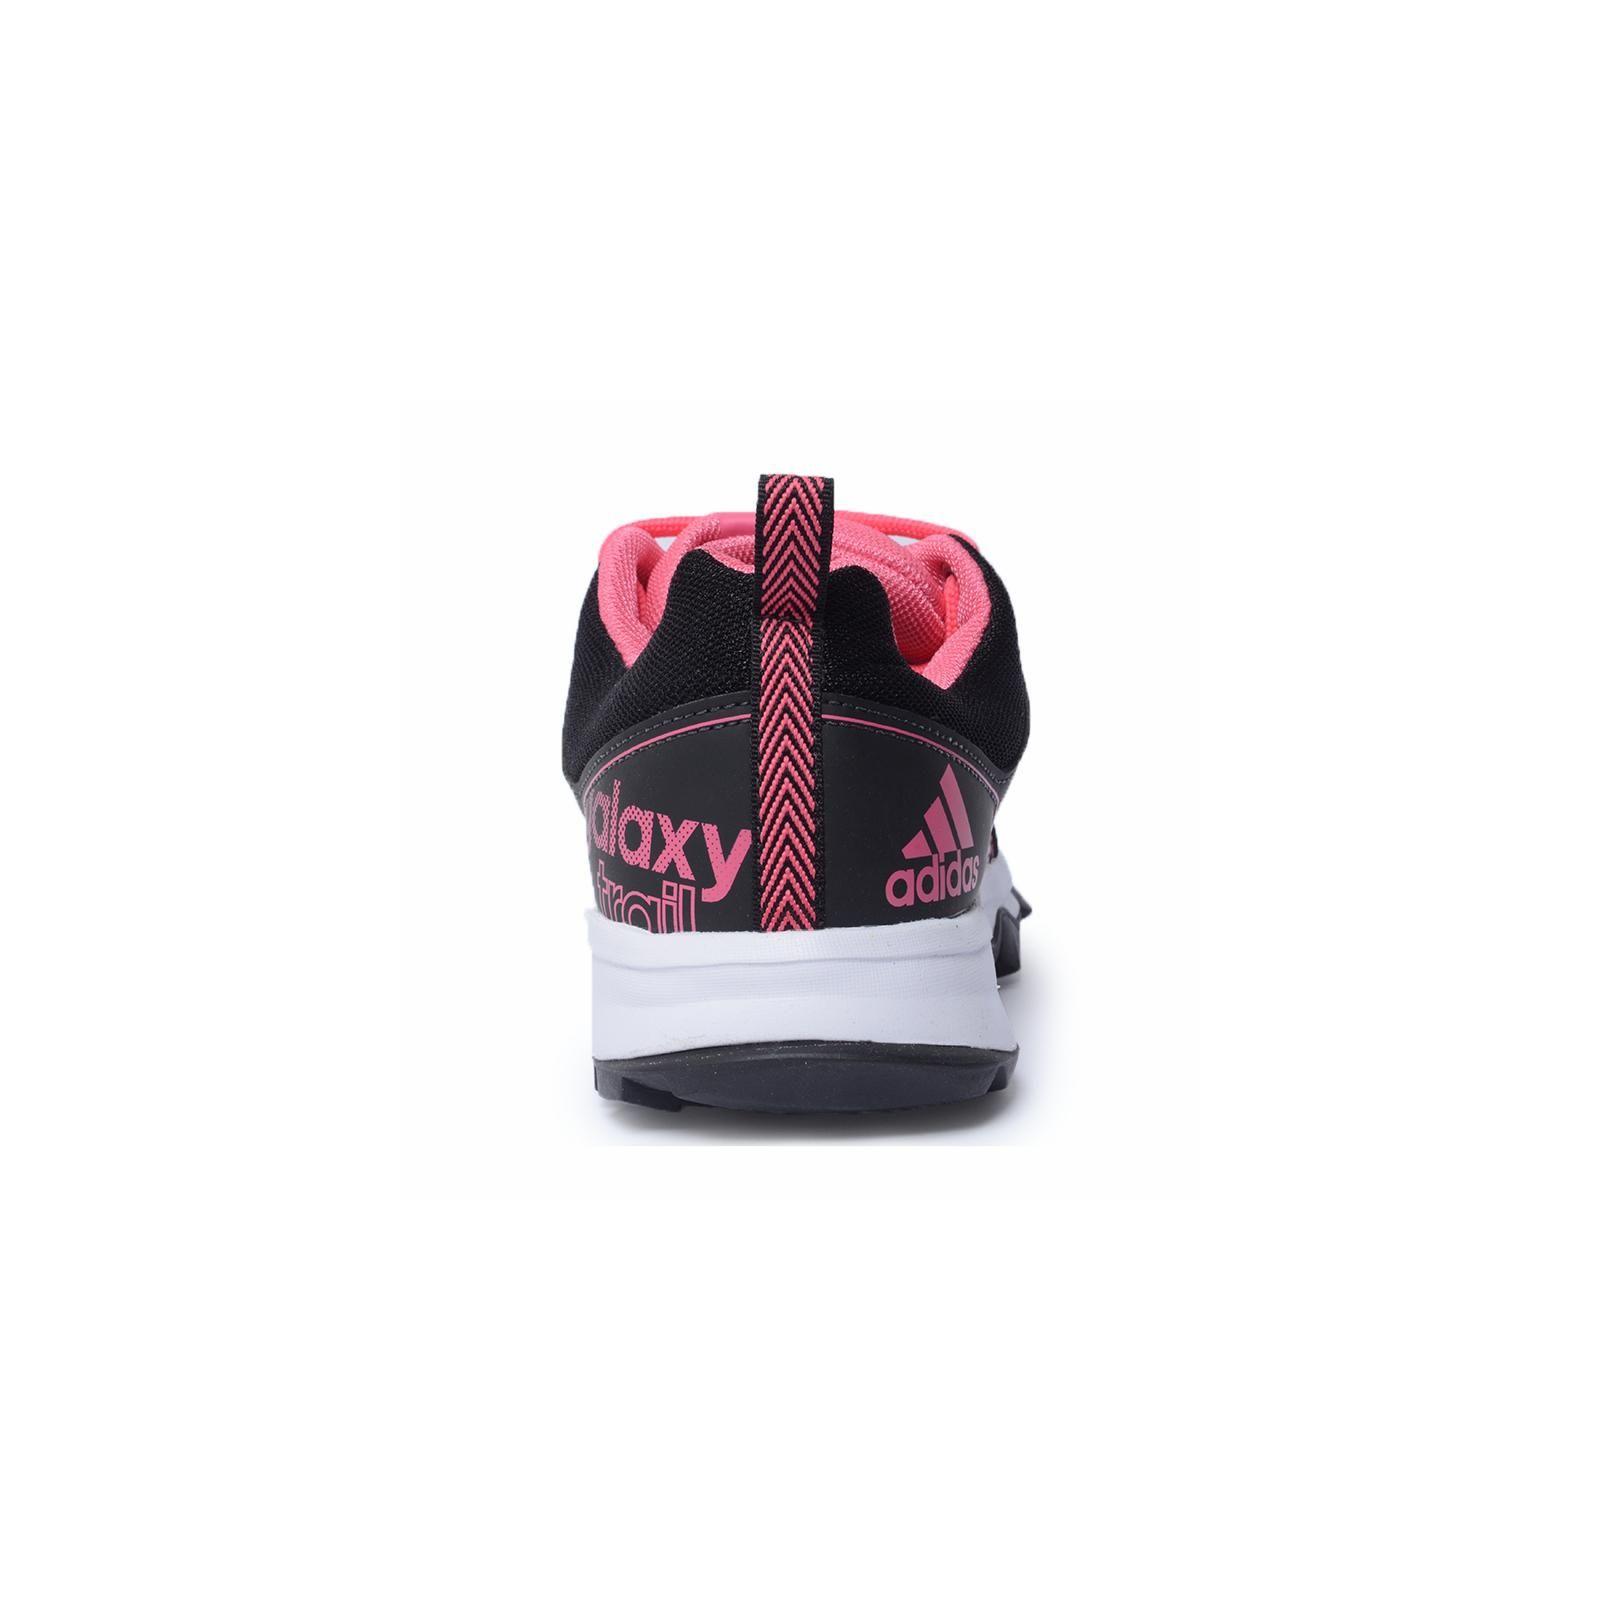 tenis adidas neo preto e rosa